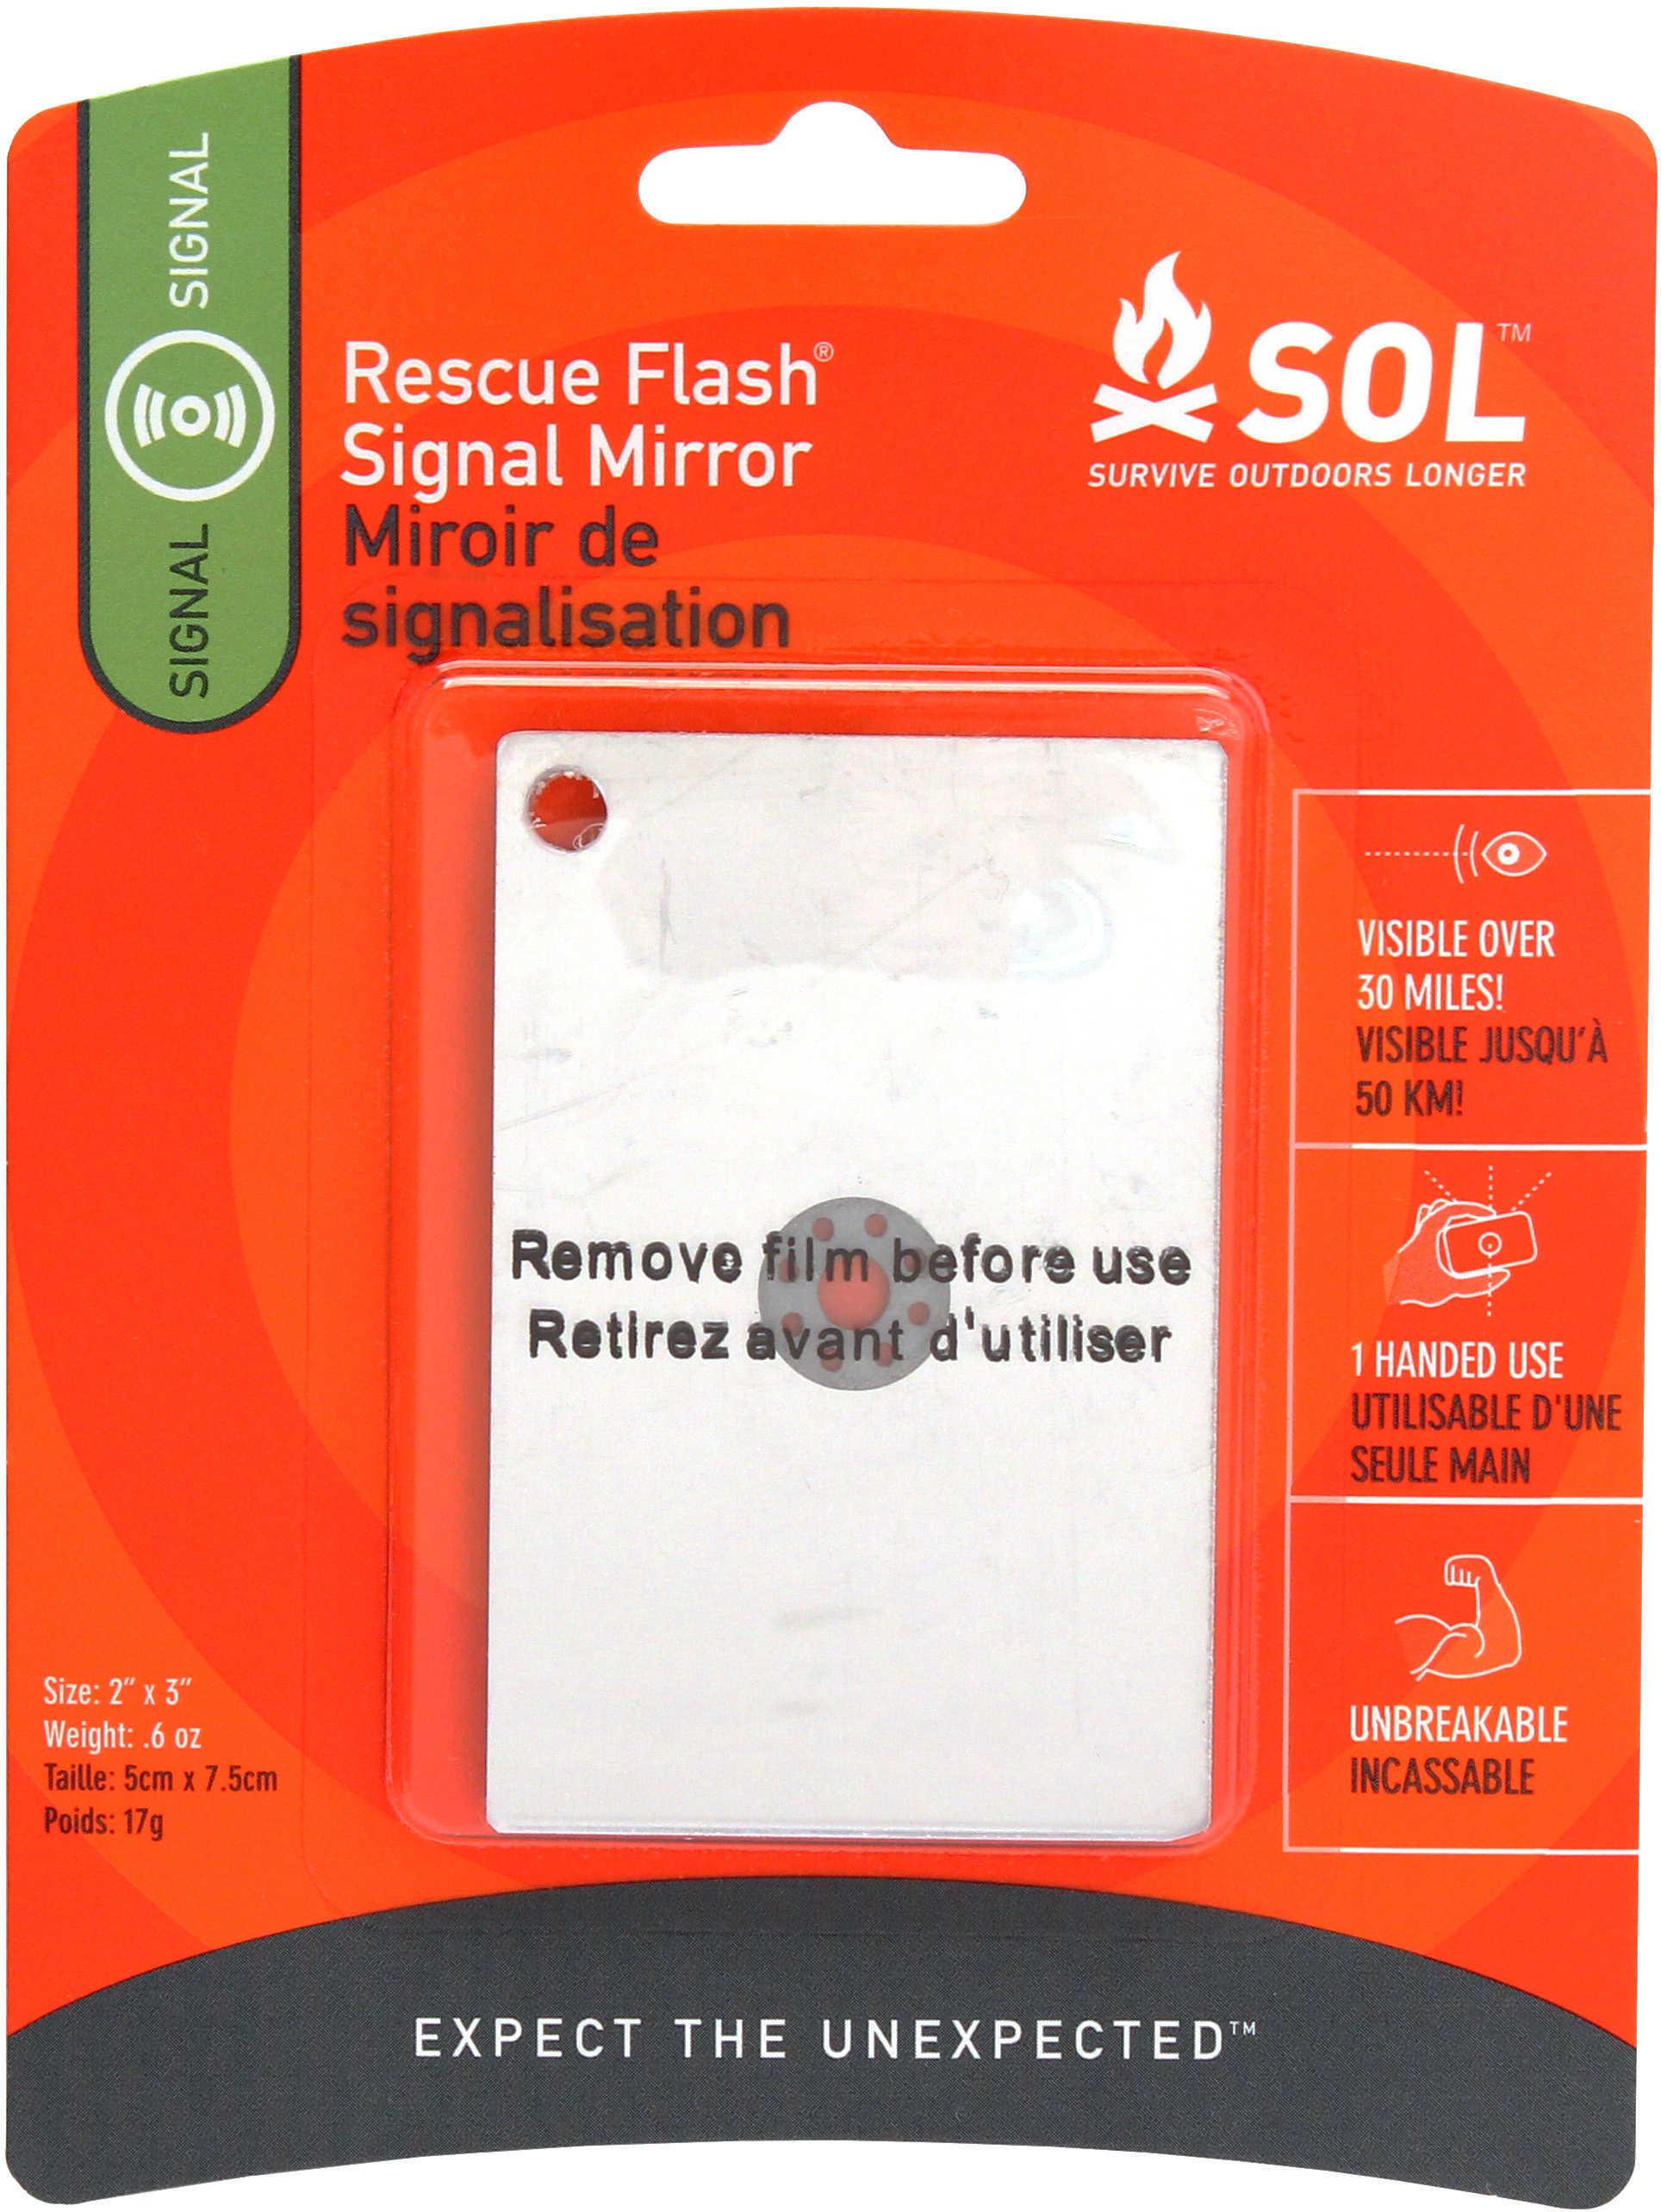 Sol Series Rescue Flash Mirror Md: 0140-1003